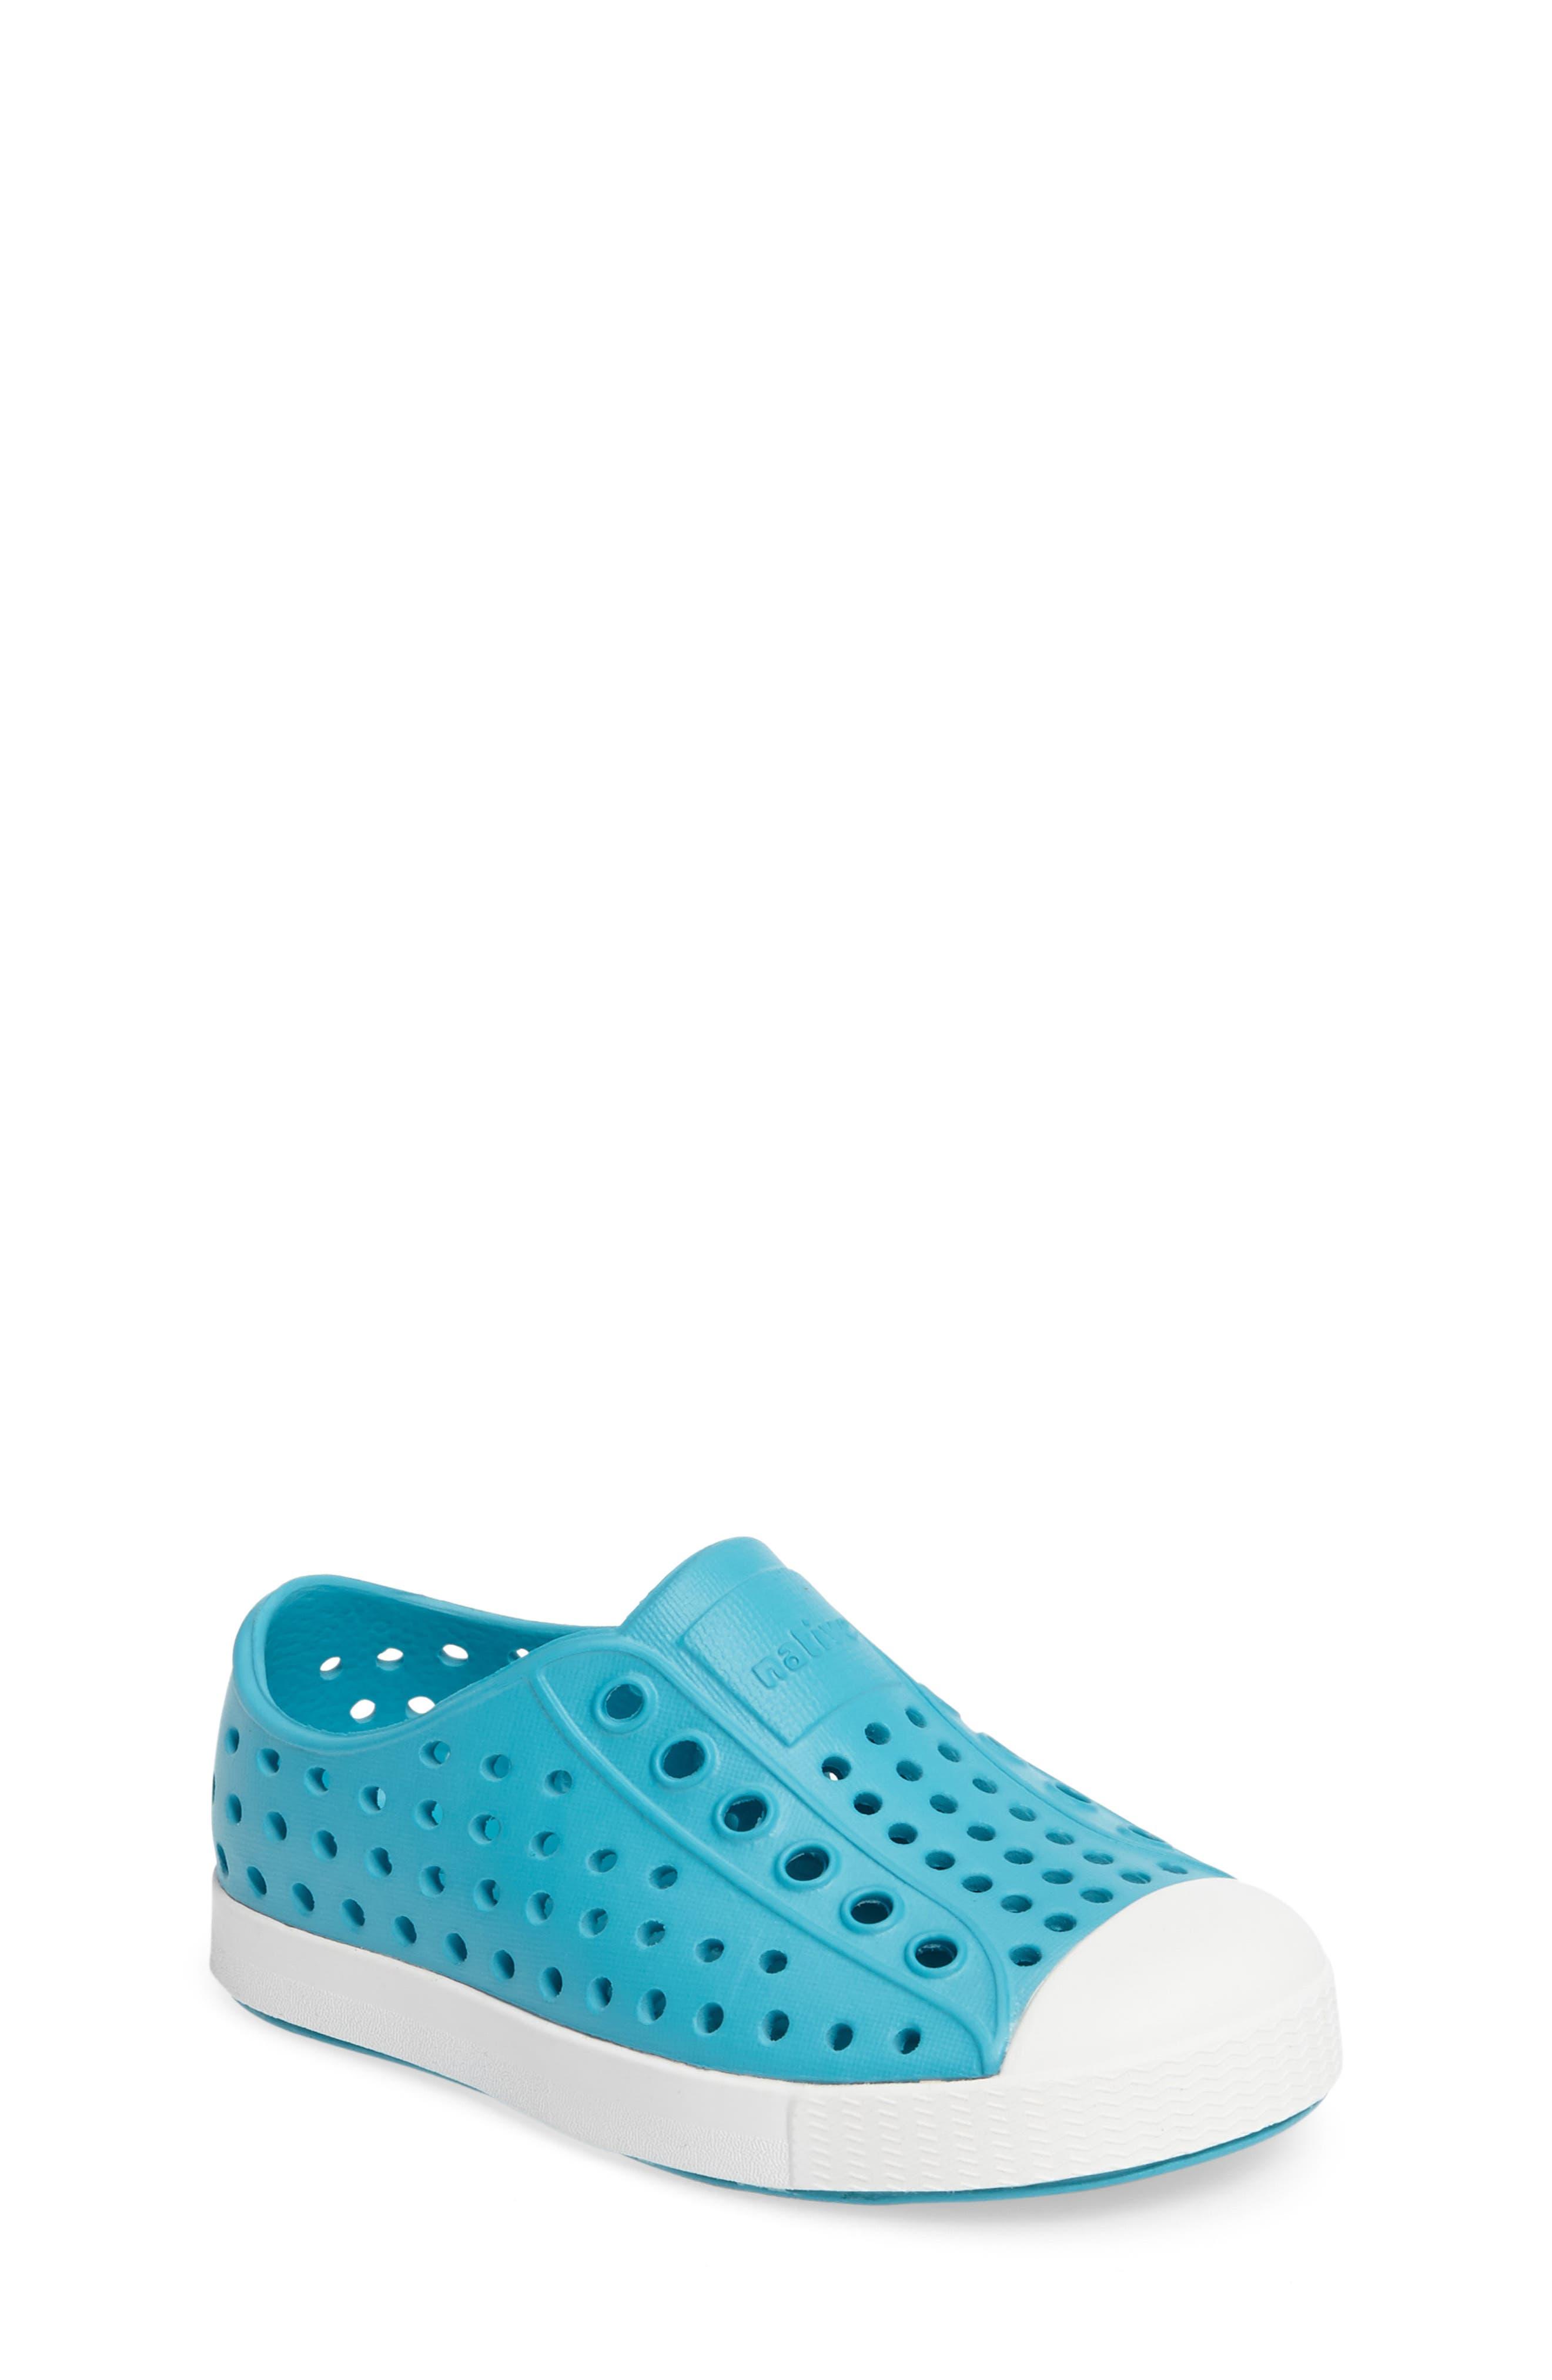 'Jefferson' Water Friendly Slip-On Sneaker,                             Main thumbnail 37, color,